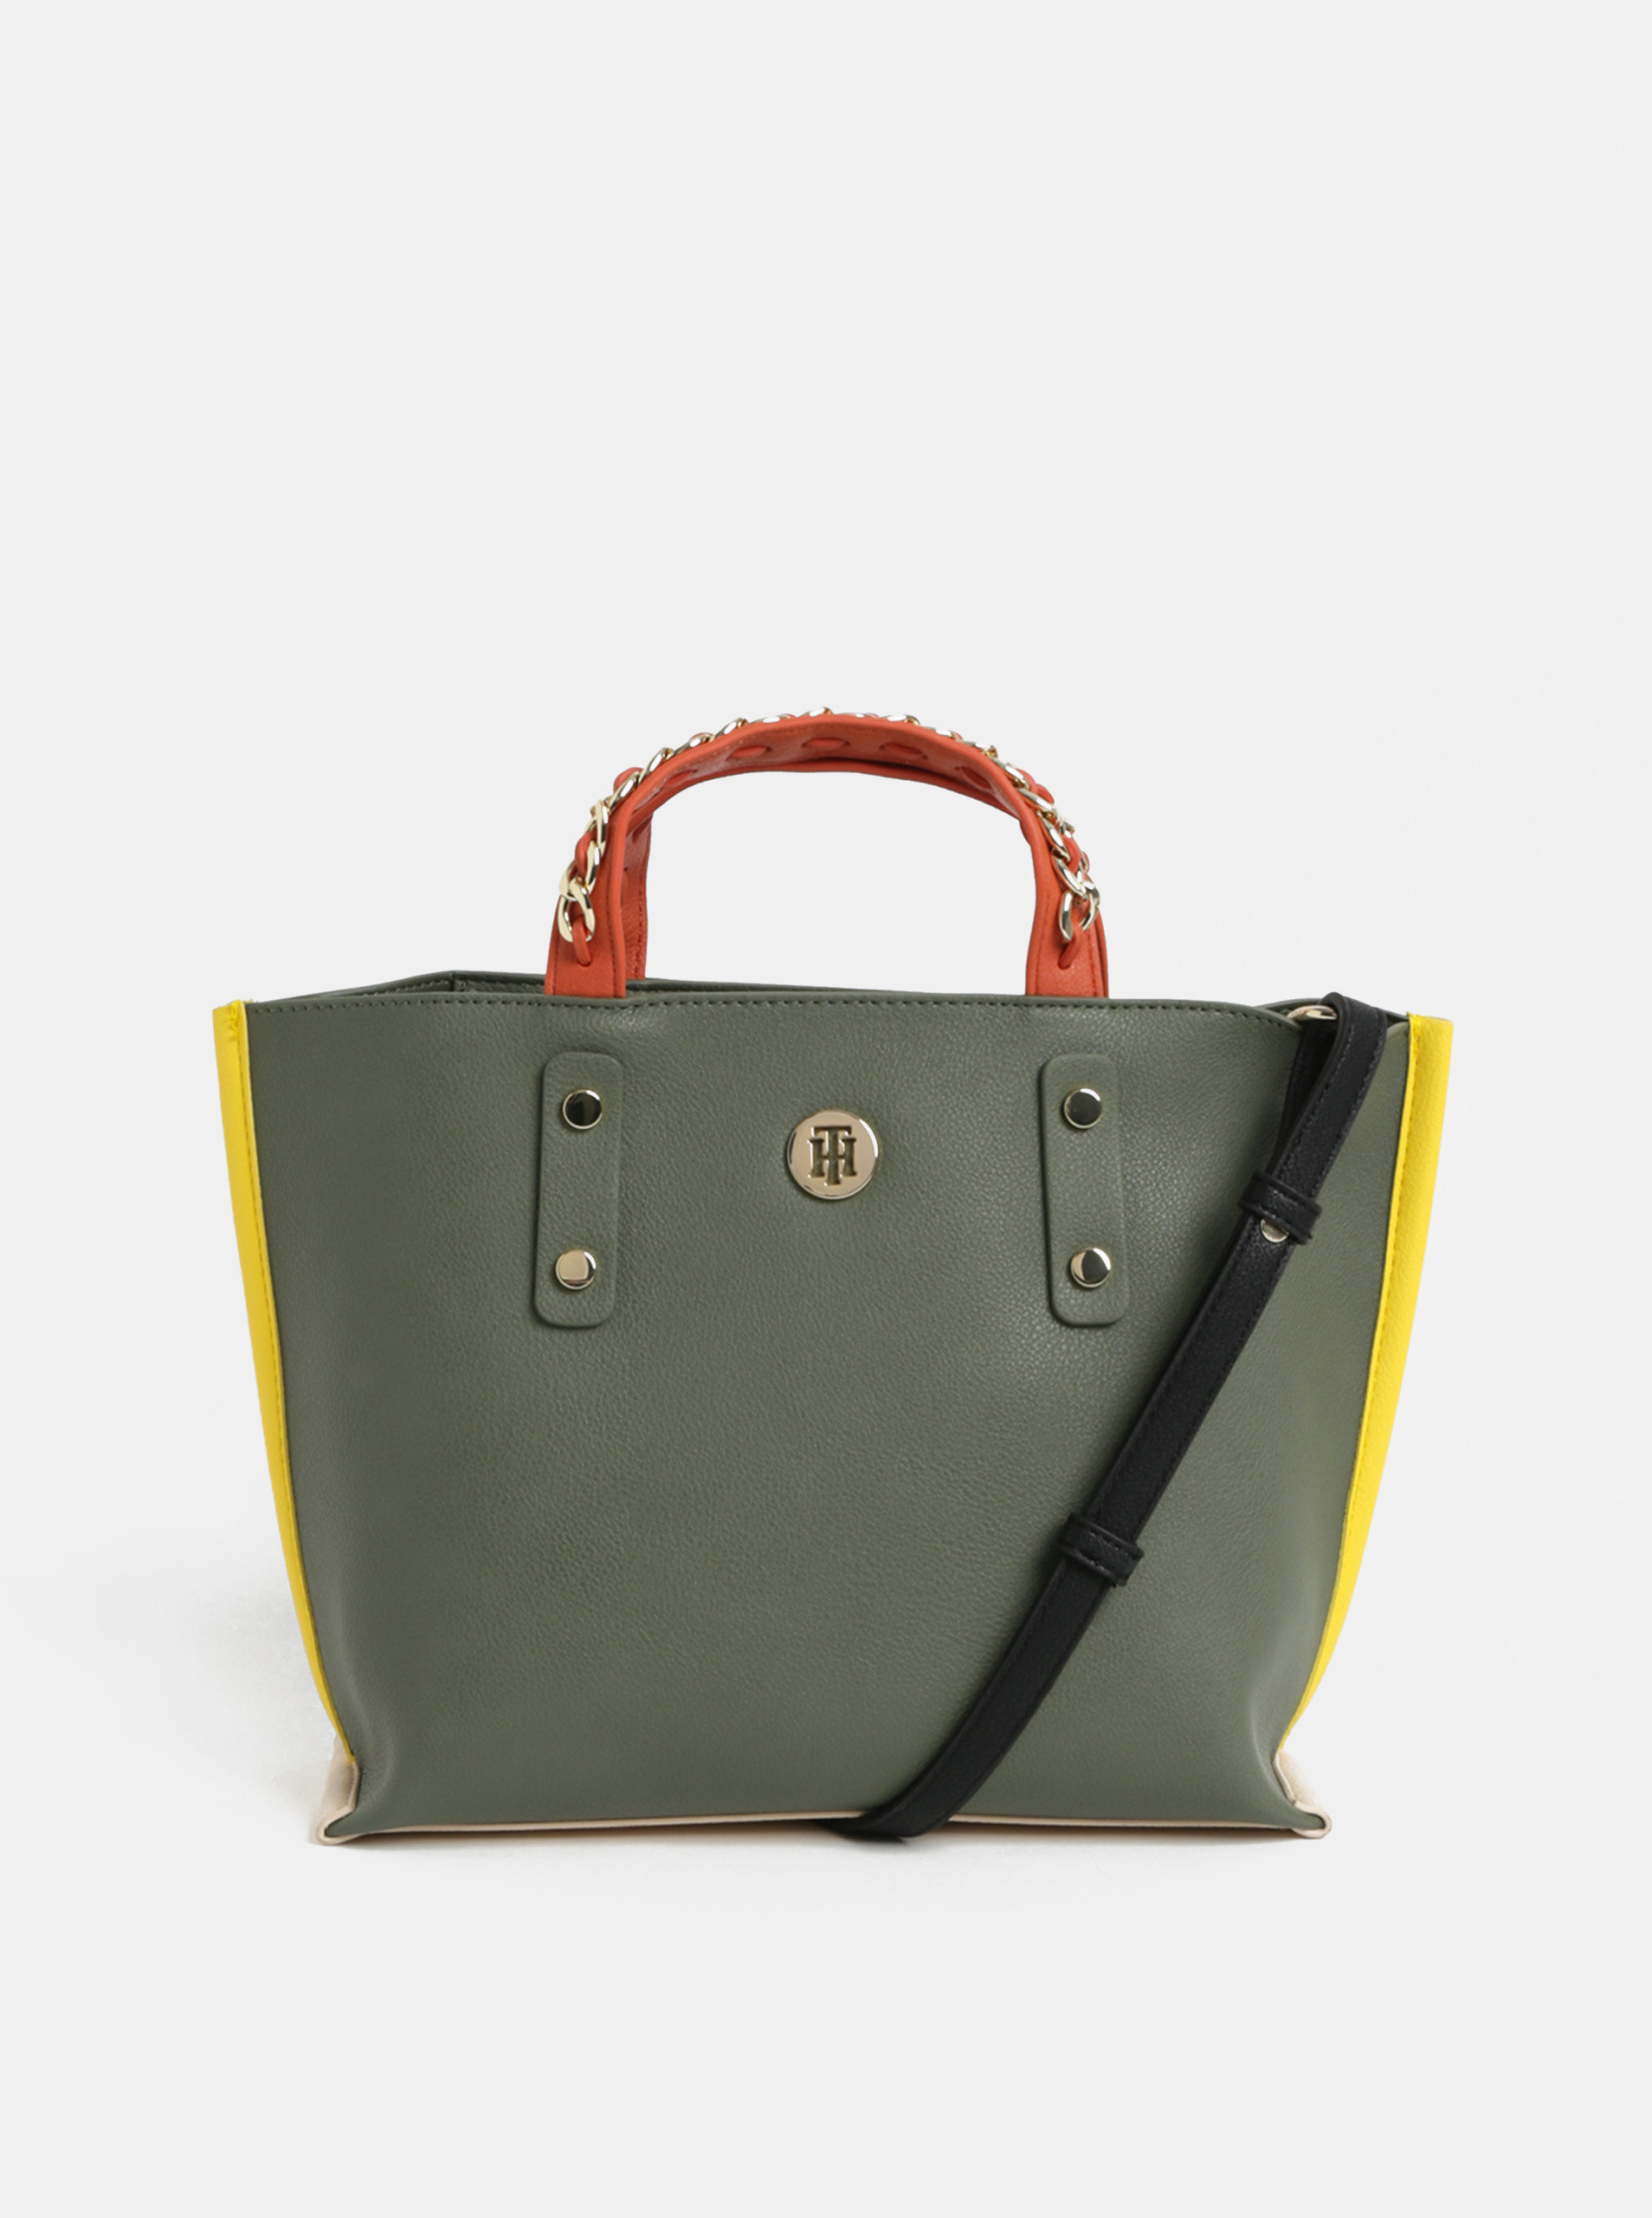 Zelená malá kabelka Tommy Hilfiger ... 2b90397f6ae